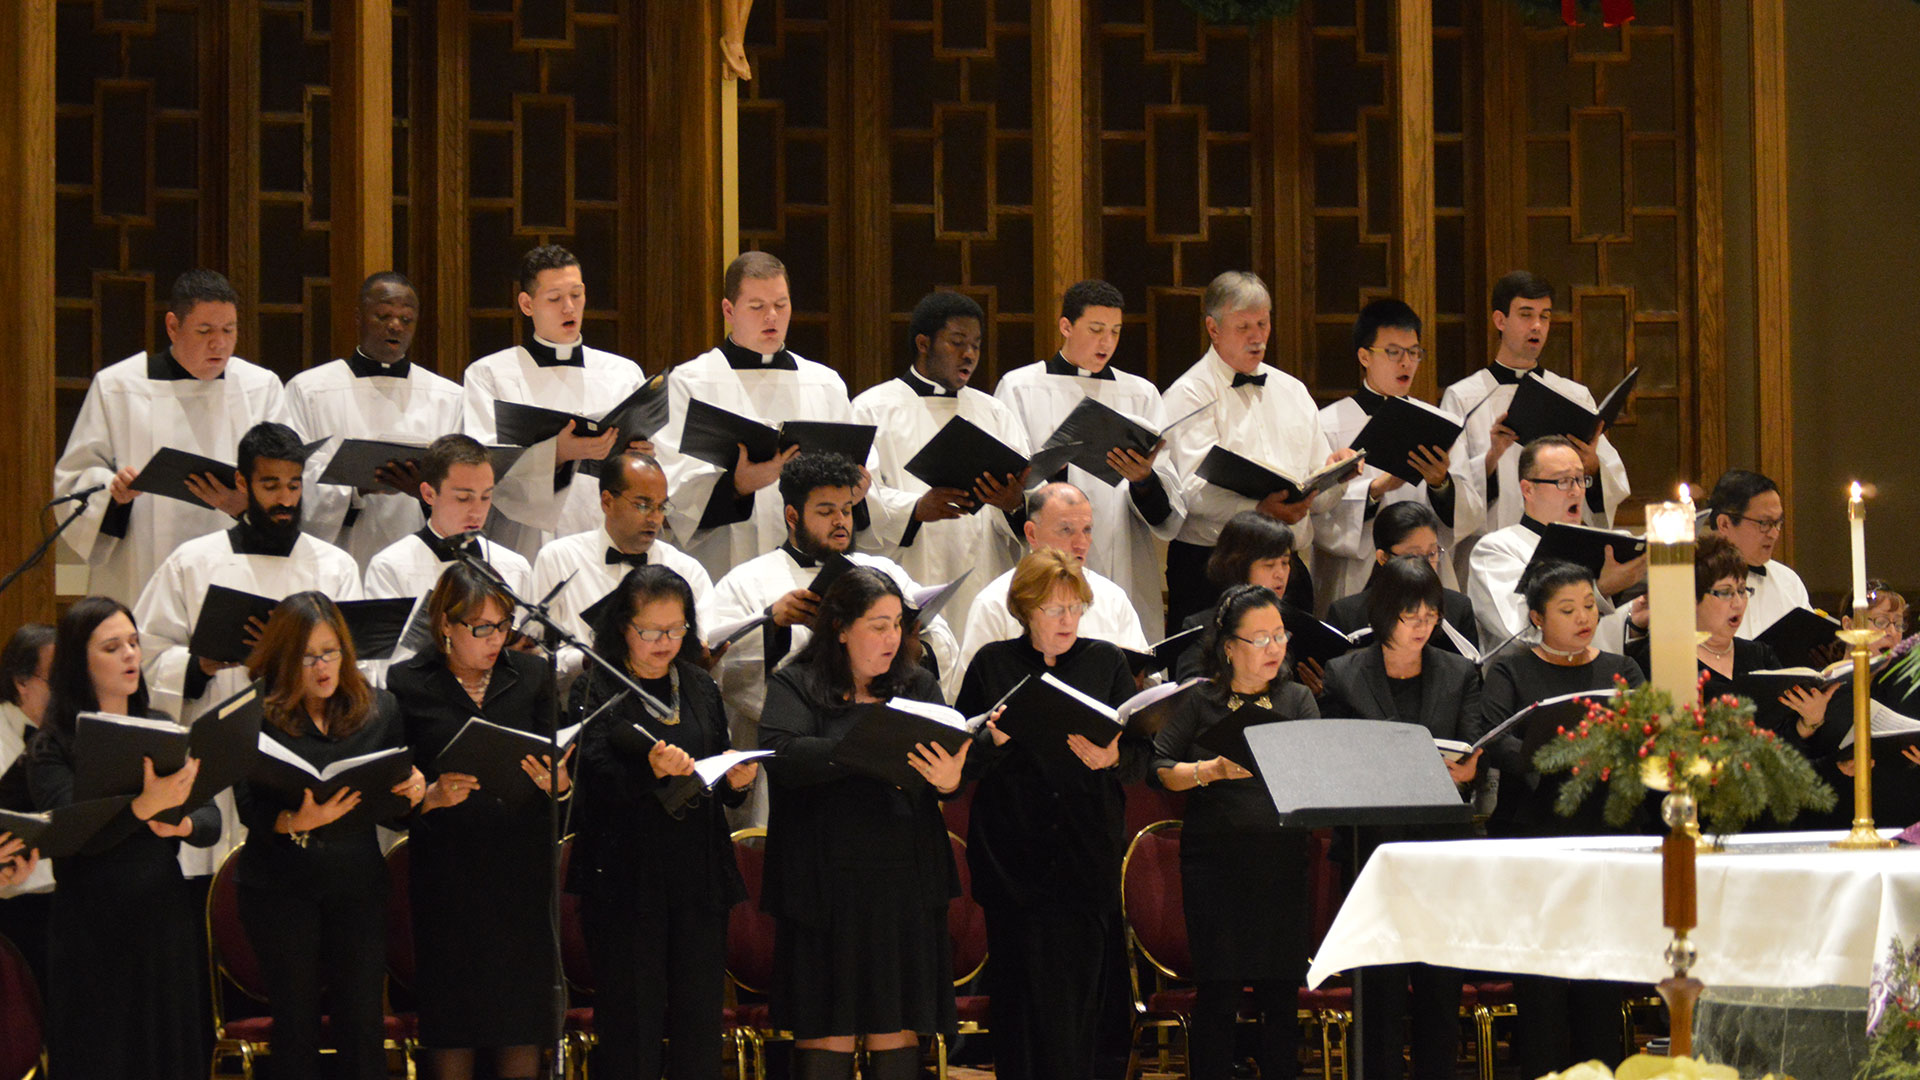 Cathedral Seminary - Carols Event